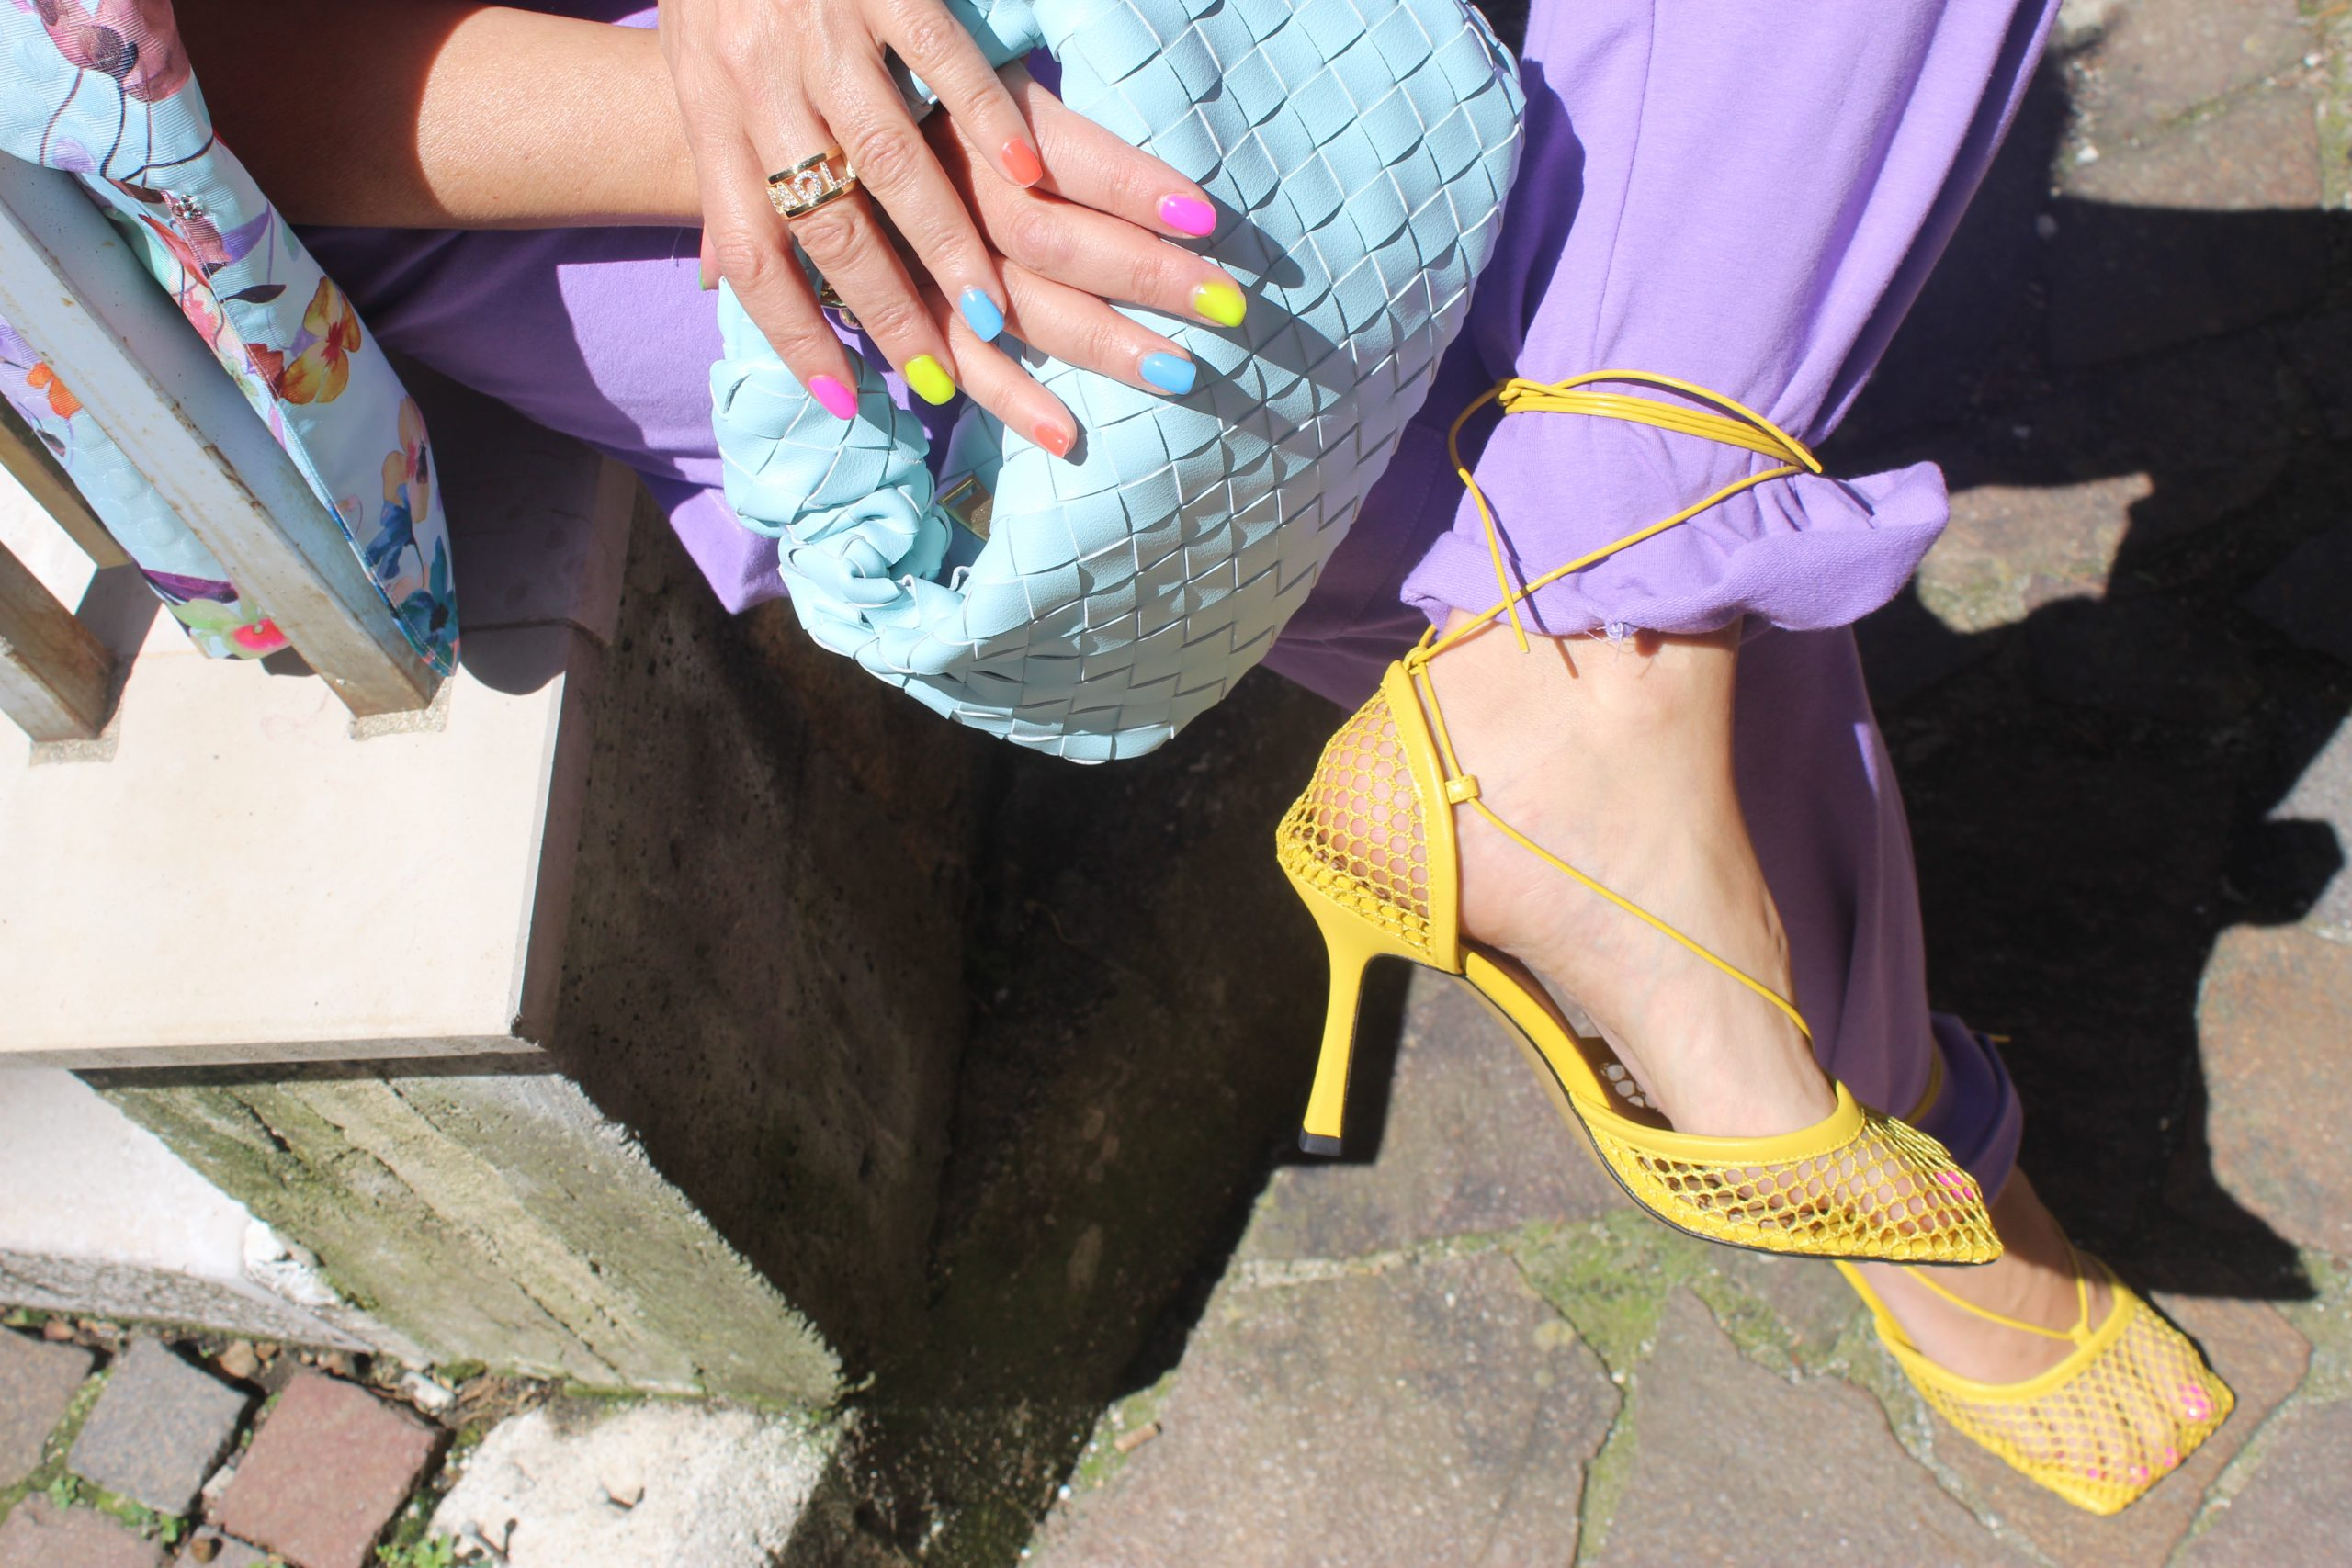 Lilac Trend Fall 2021 Color Block Asos Jumpsuit Bottega Veneta Bag Lana Caprina Blazer Paola Lauretano